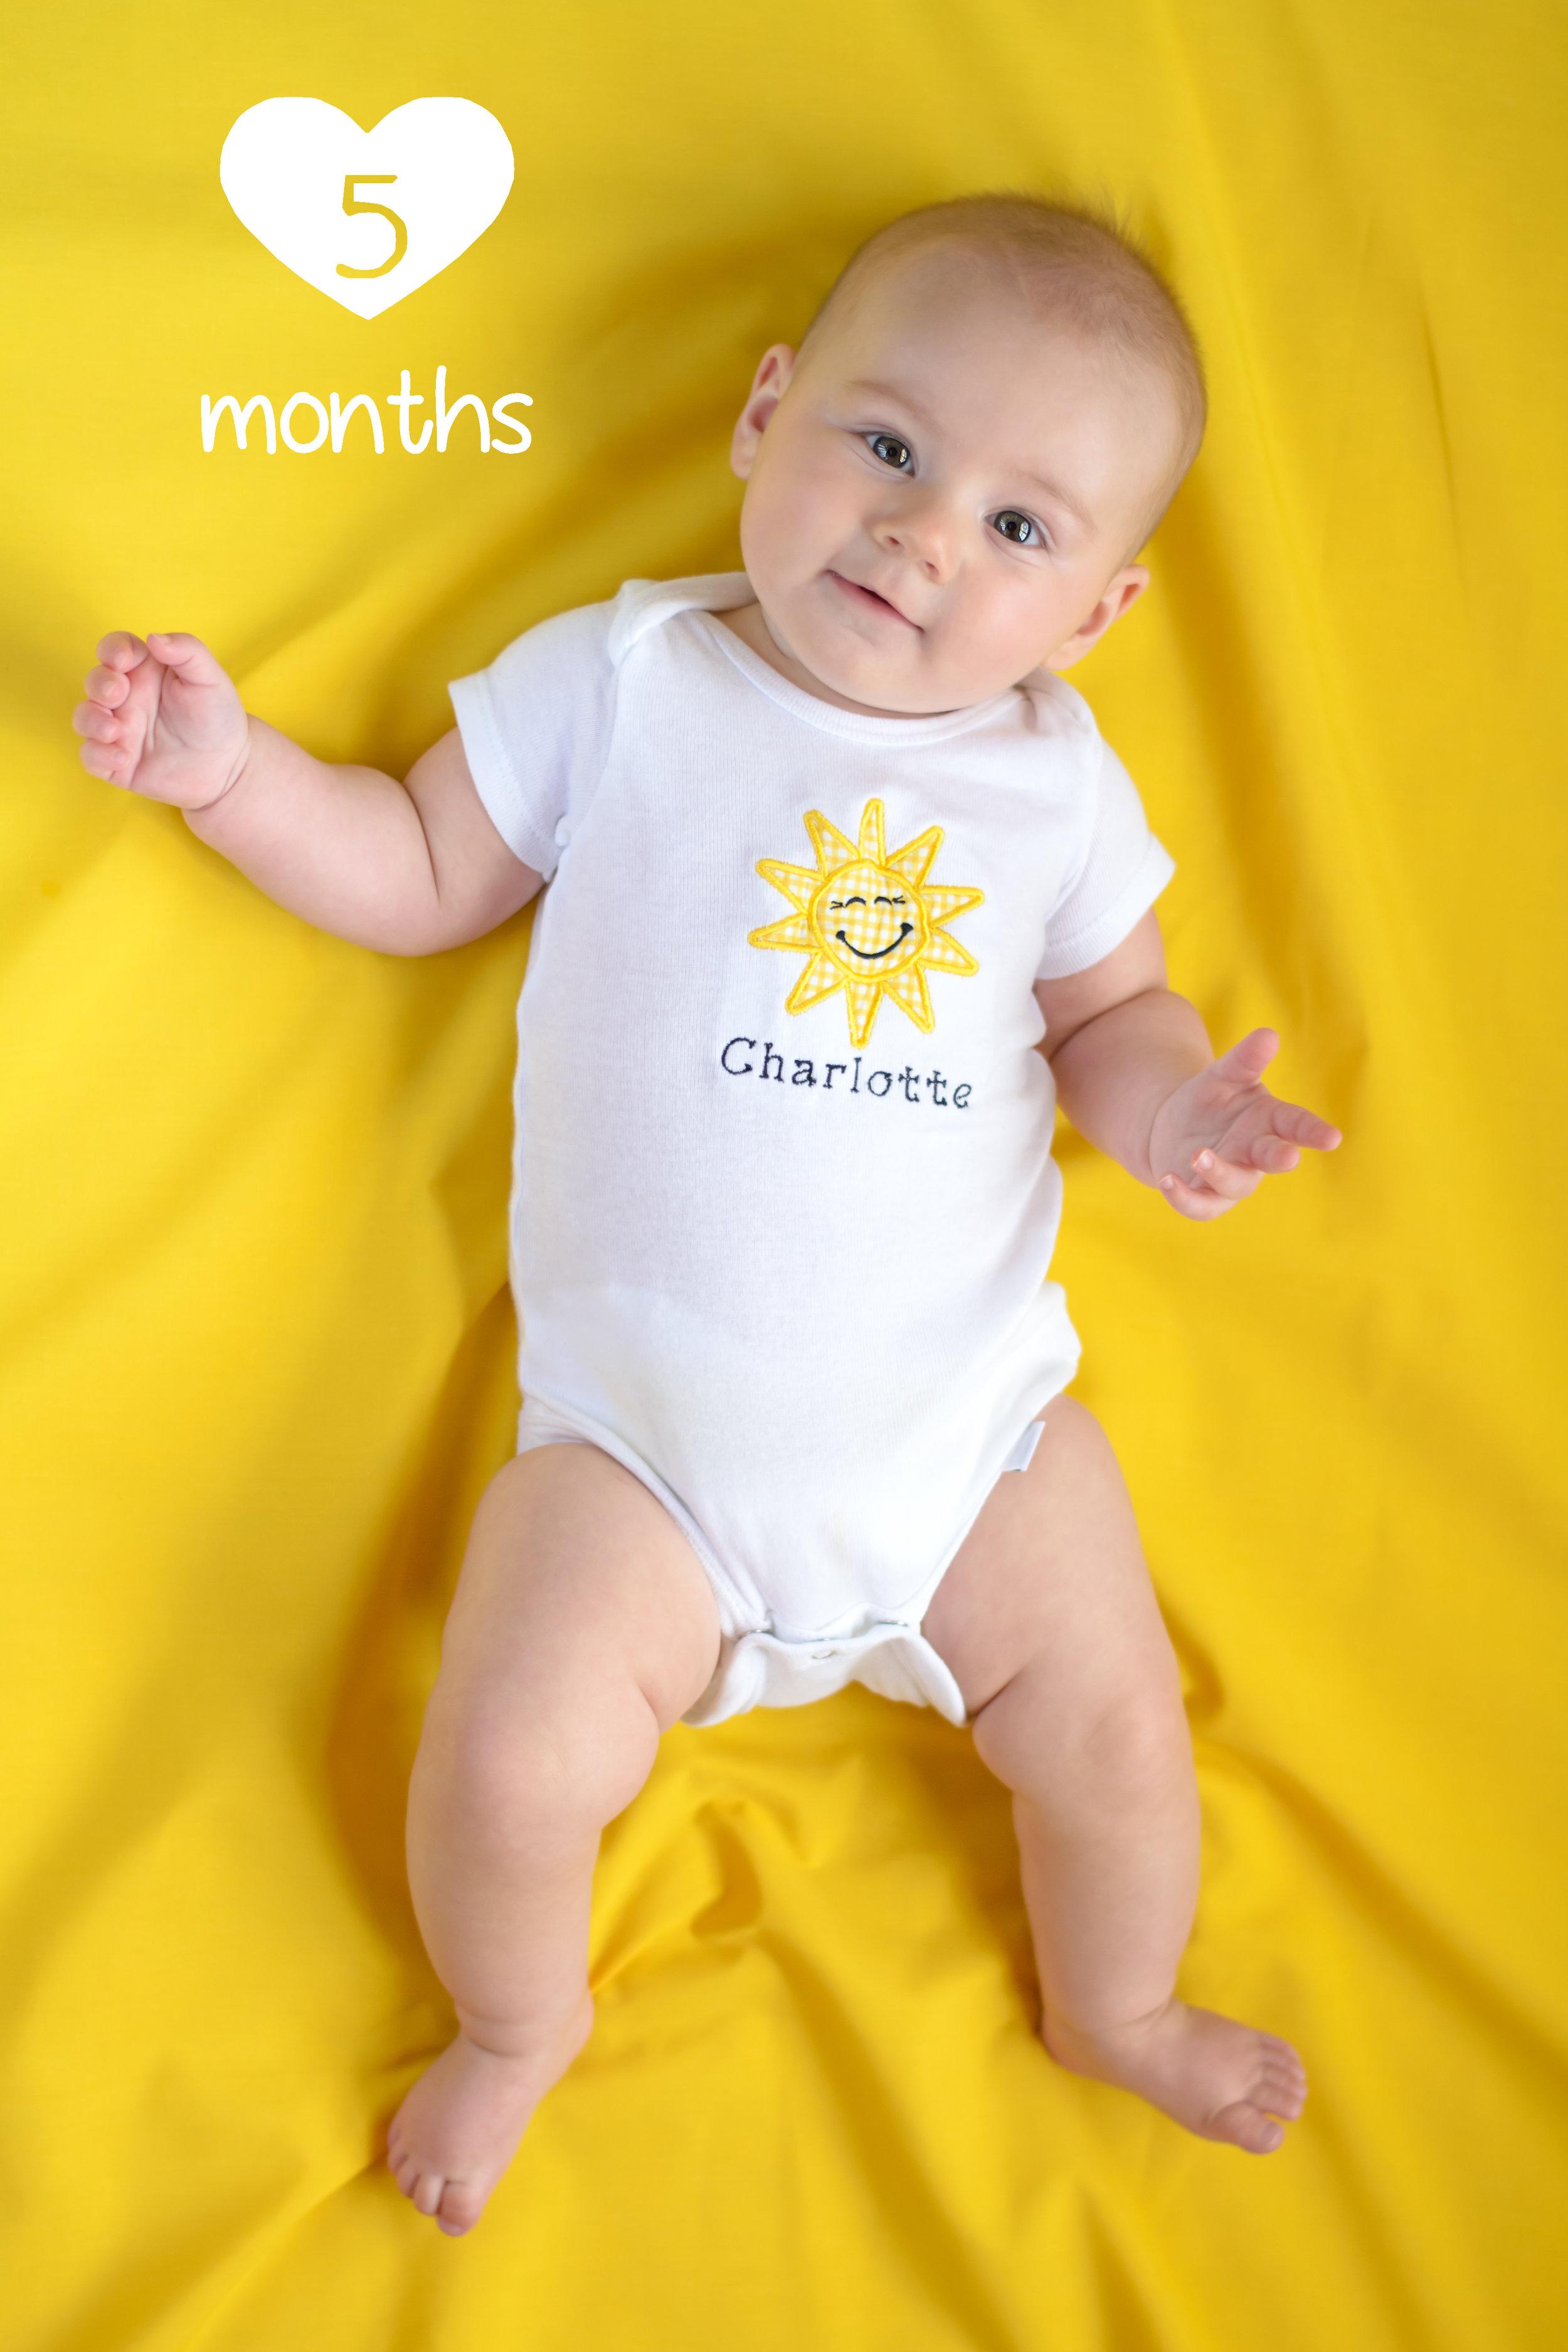 charlotte 5 months